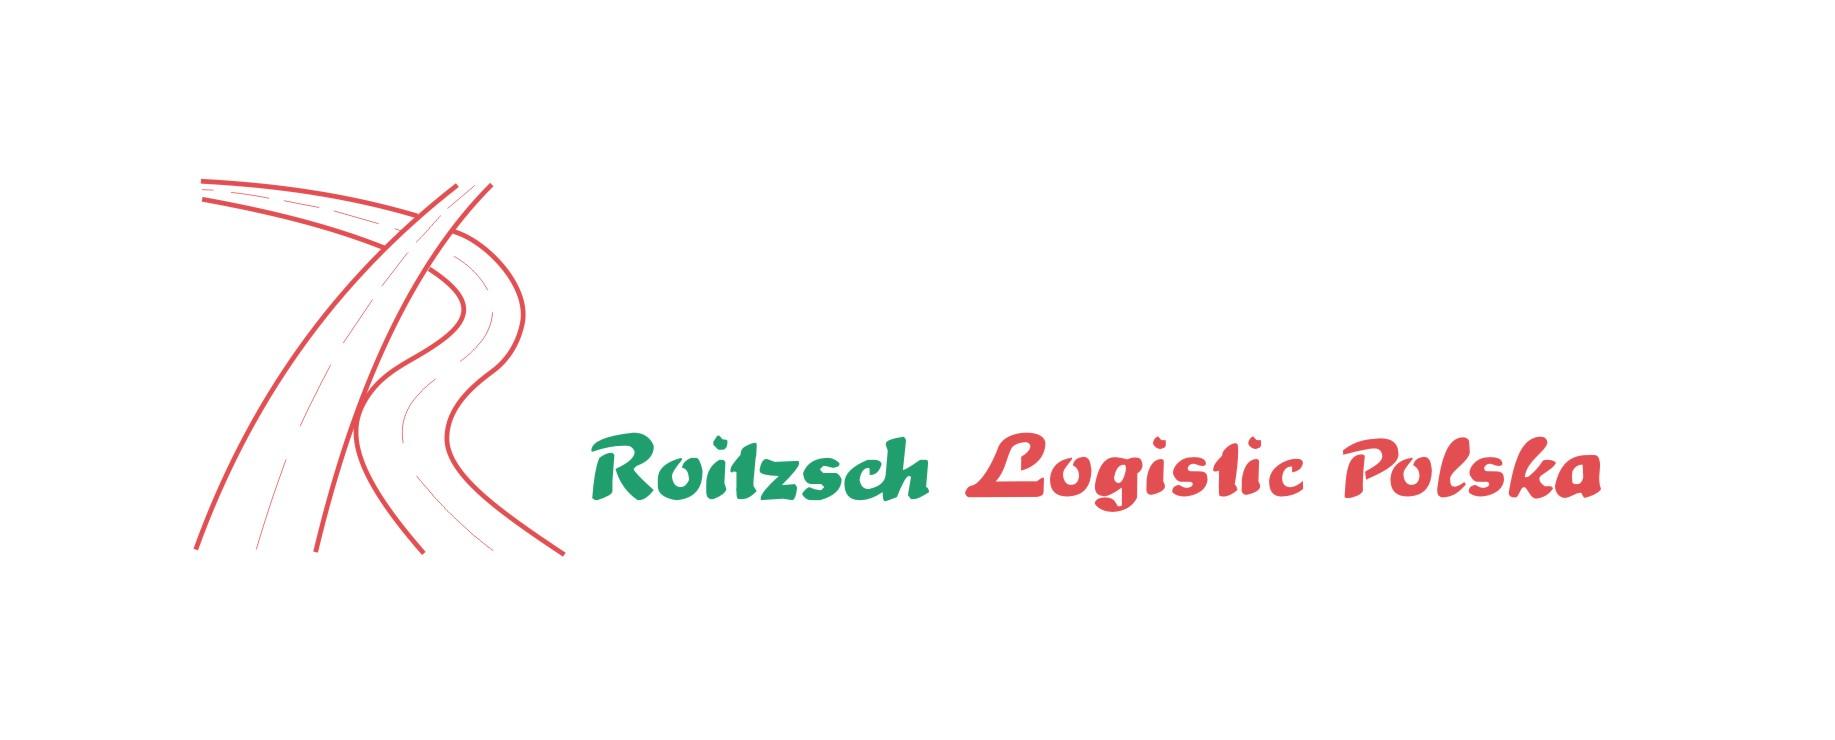 Roitzsch Logistic Polska, Sp.z o.o., Opole